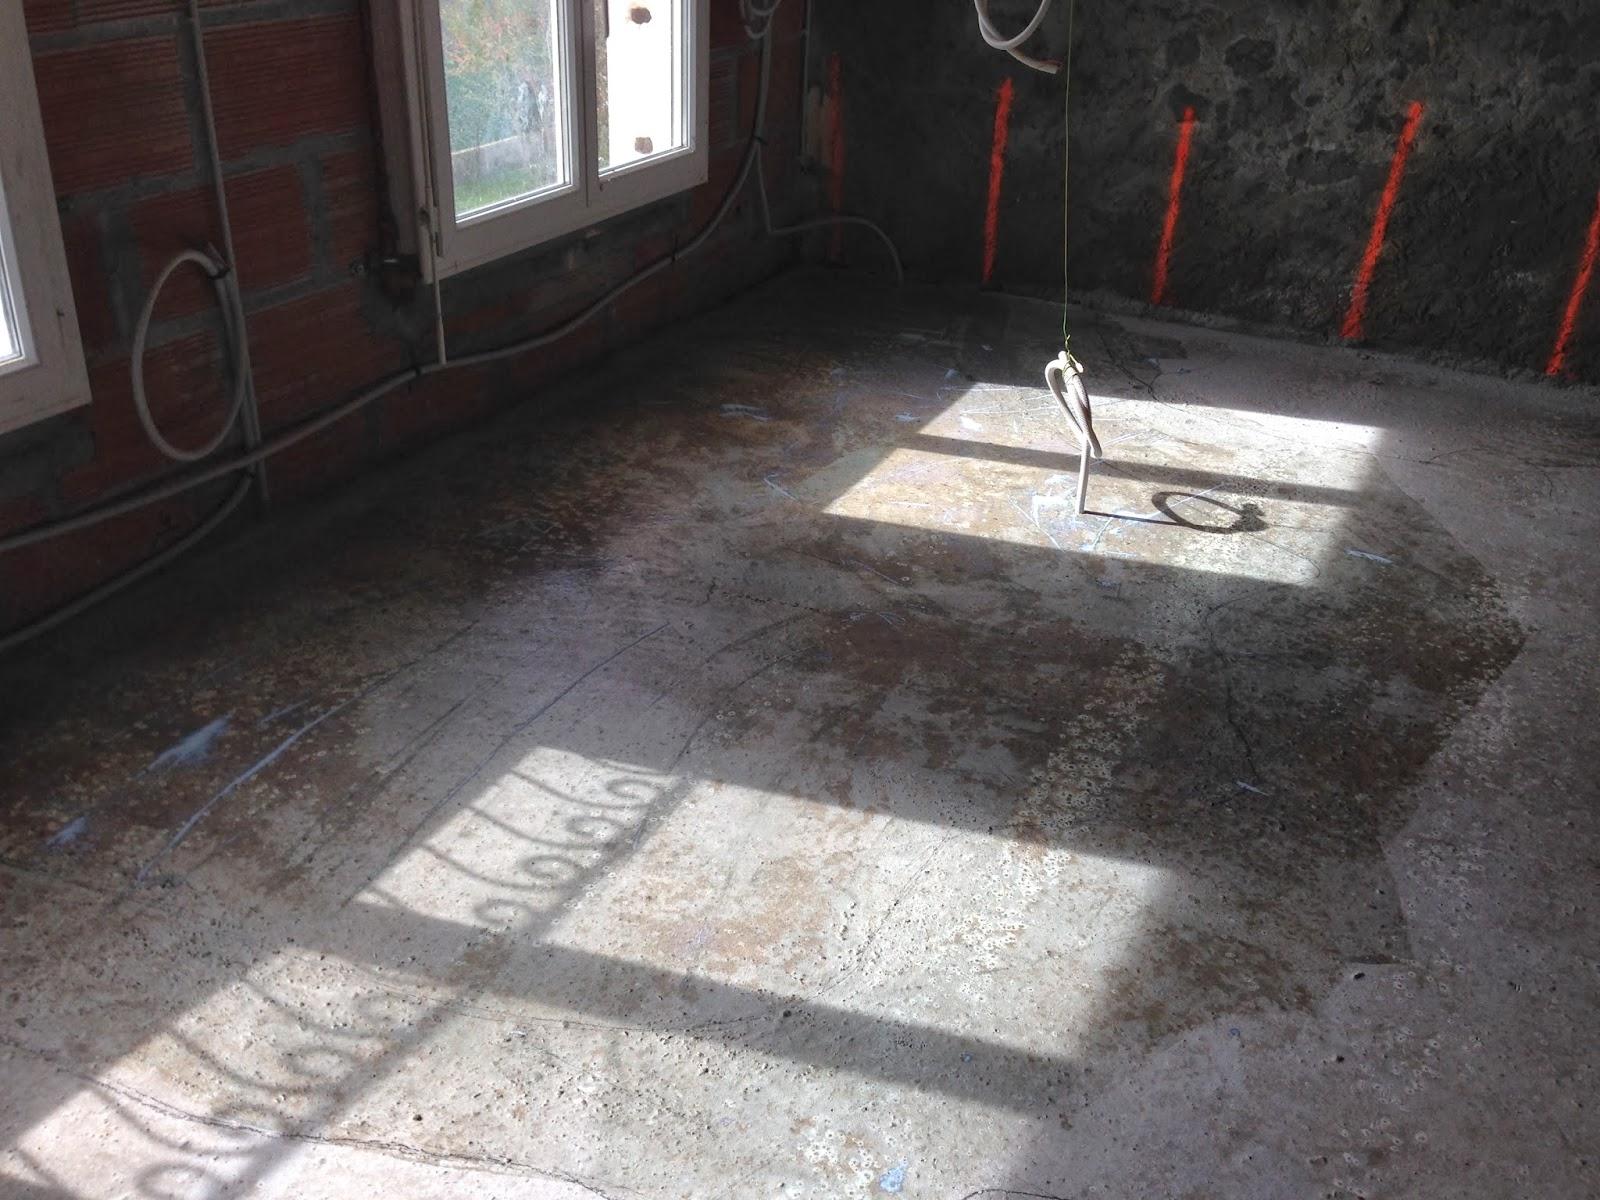 Notre projet ragr age plancher hourdis for Ragreage sur plancher agglomere